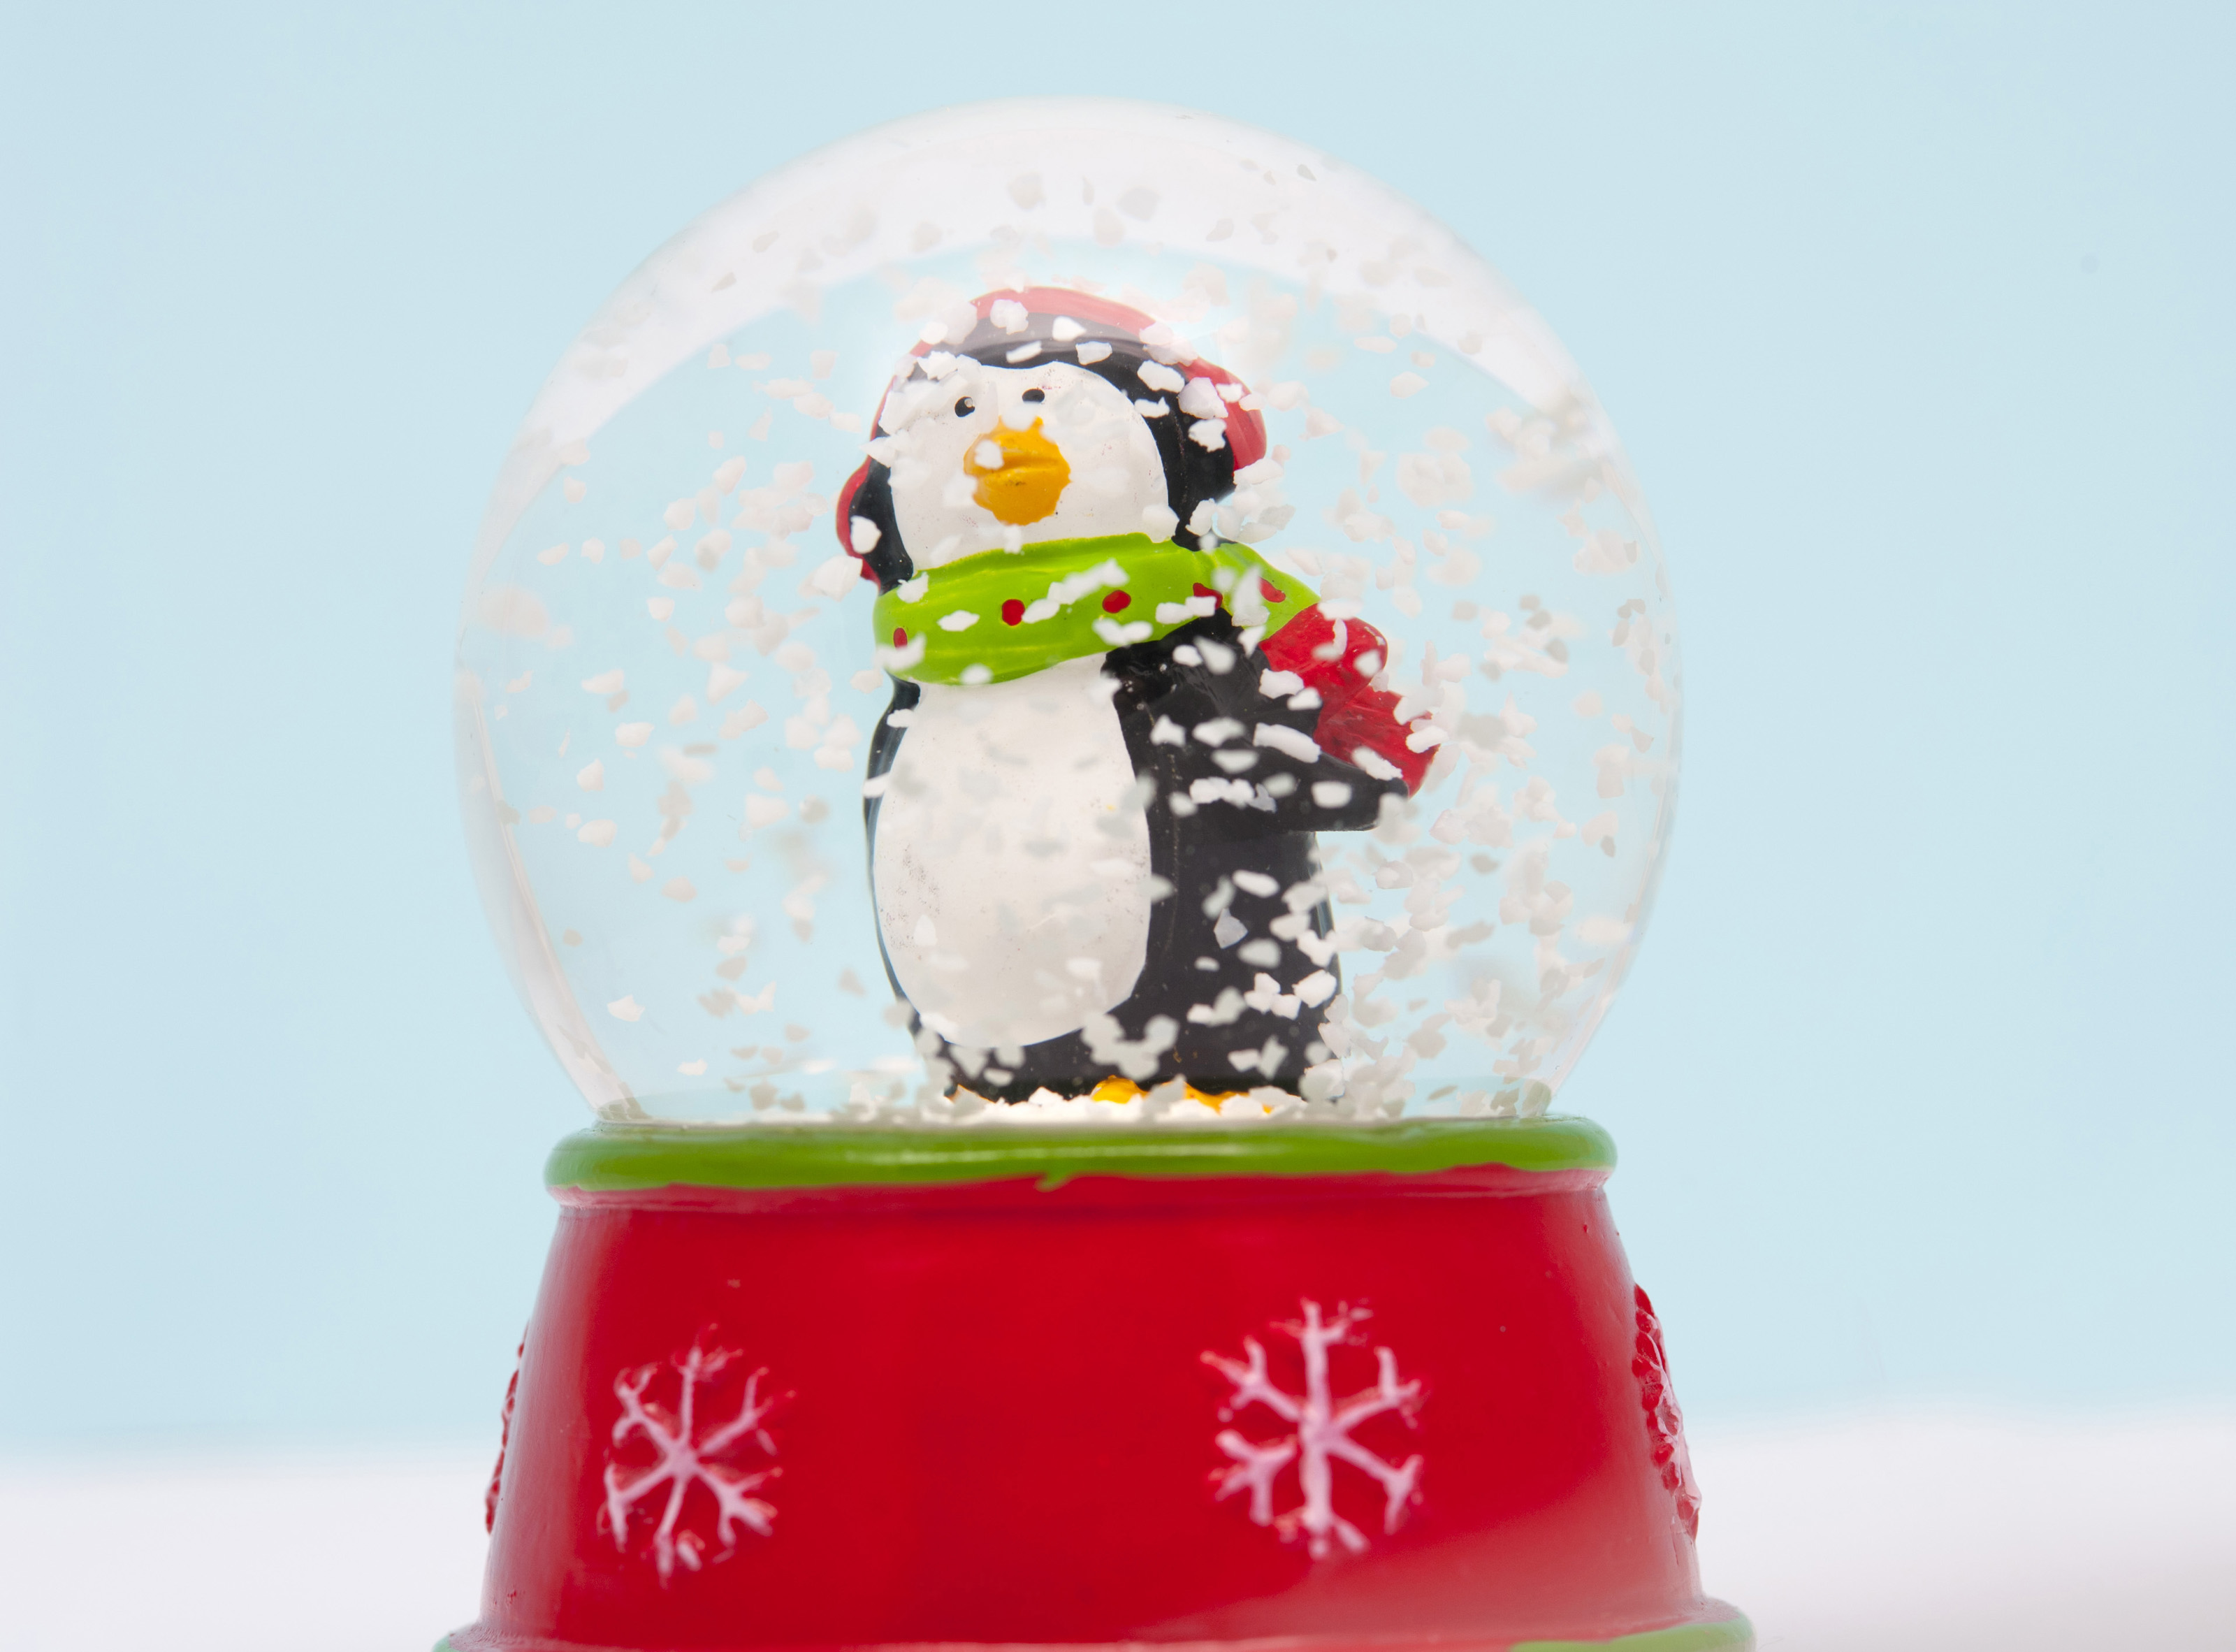 Alfa img - Showing > Large Snow Globe with Penguins